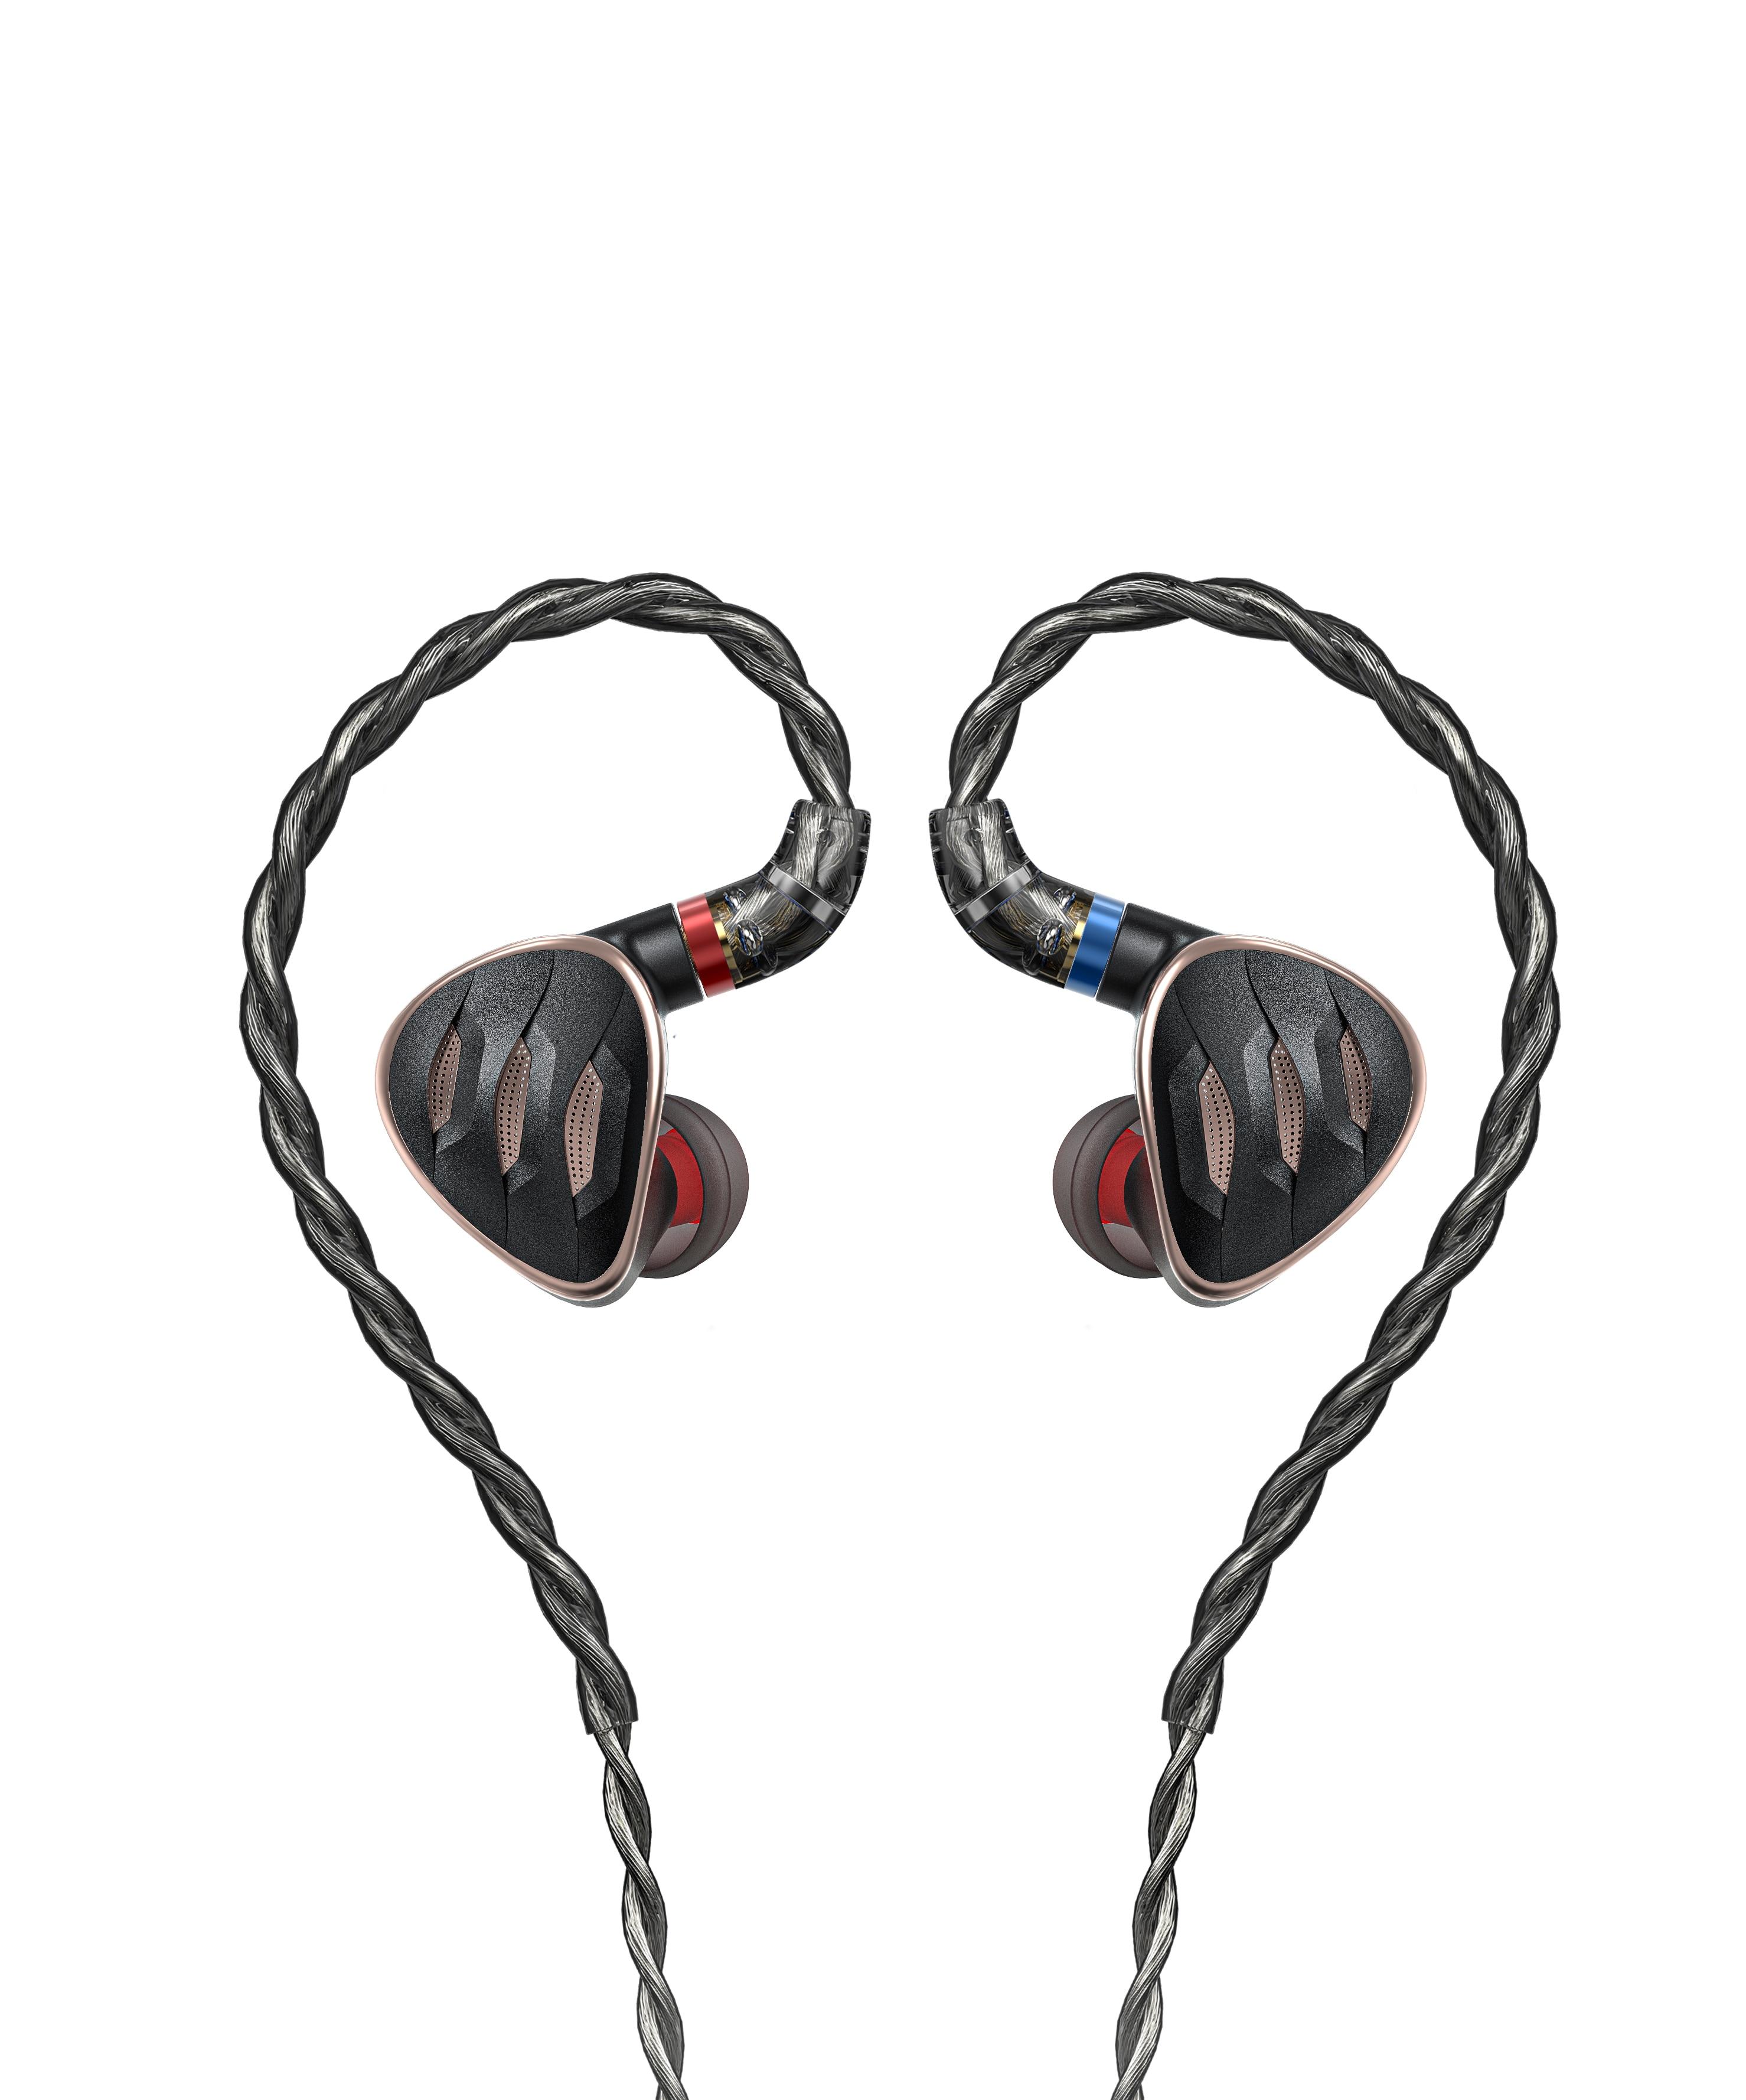 FiiO FH5s برو ستيريو HiFi سماعات أذن داخل الأذن السلكية سماعات IEM 2BA + 2DD مع 2.5/3.5/4.4 مللي متر التوصيل MMCX انفصال كابلات الموصلات